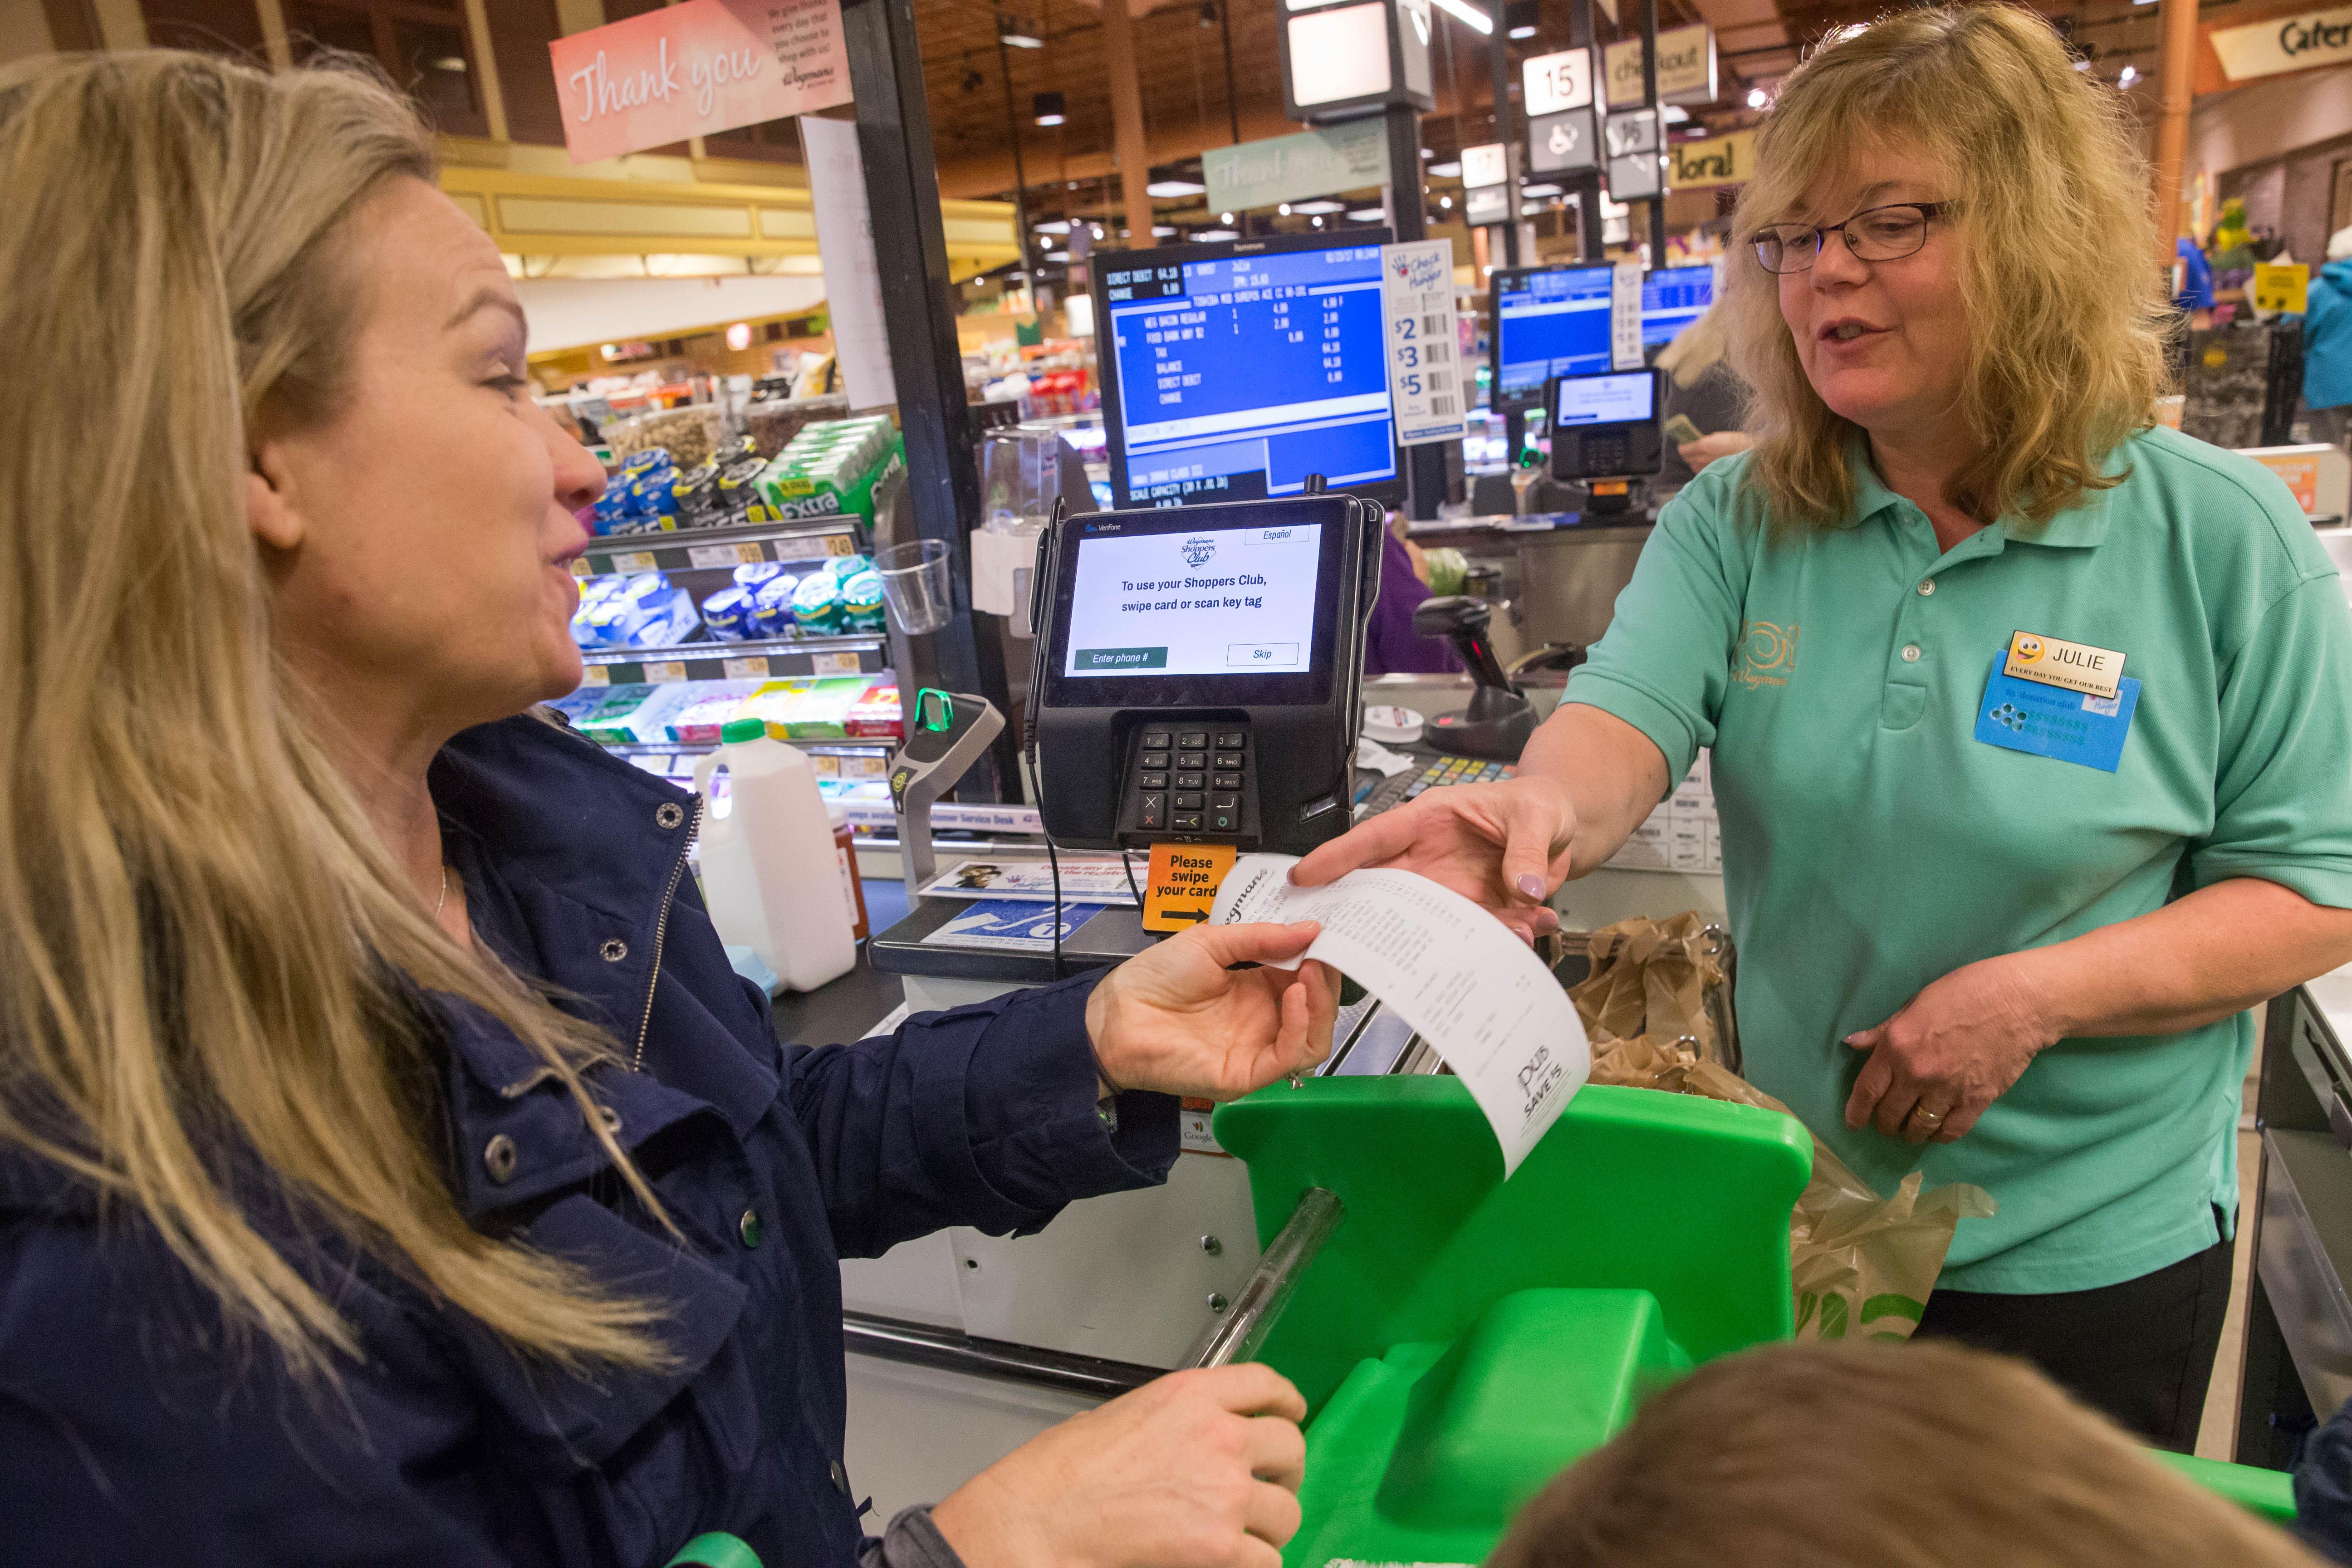 Nora Macnamee of Lewiston gets her receipt from cashier Julie Juzwicki while checking out at the Wegmans in Niagara Falls.  (Derek Gee/Buffalo News)